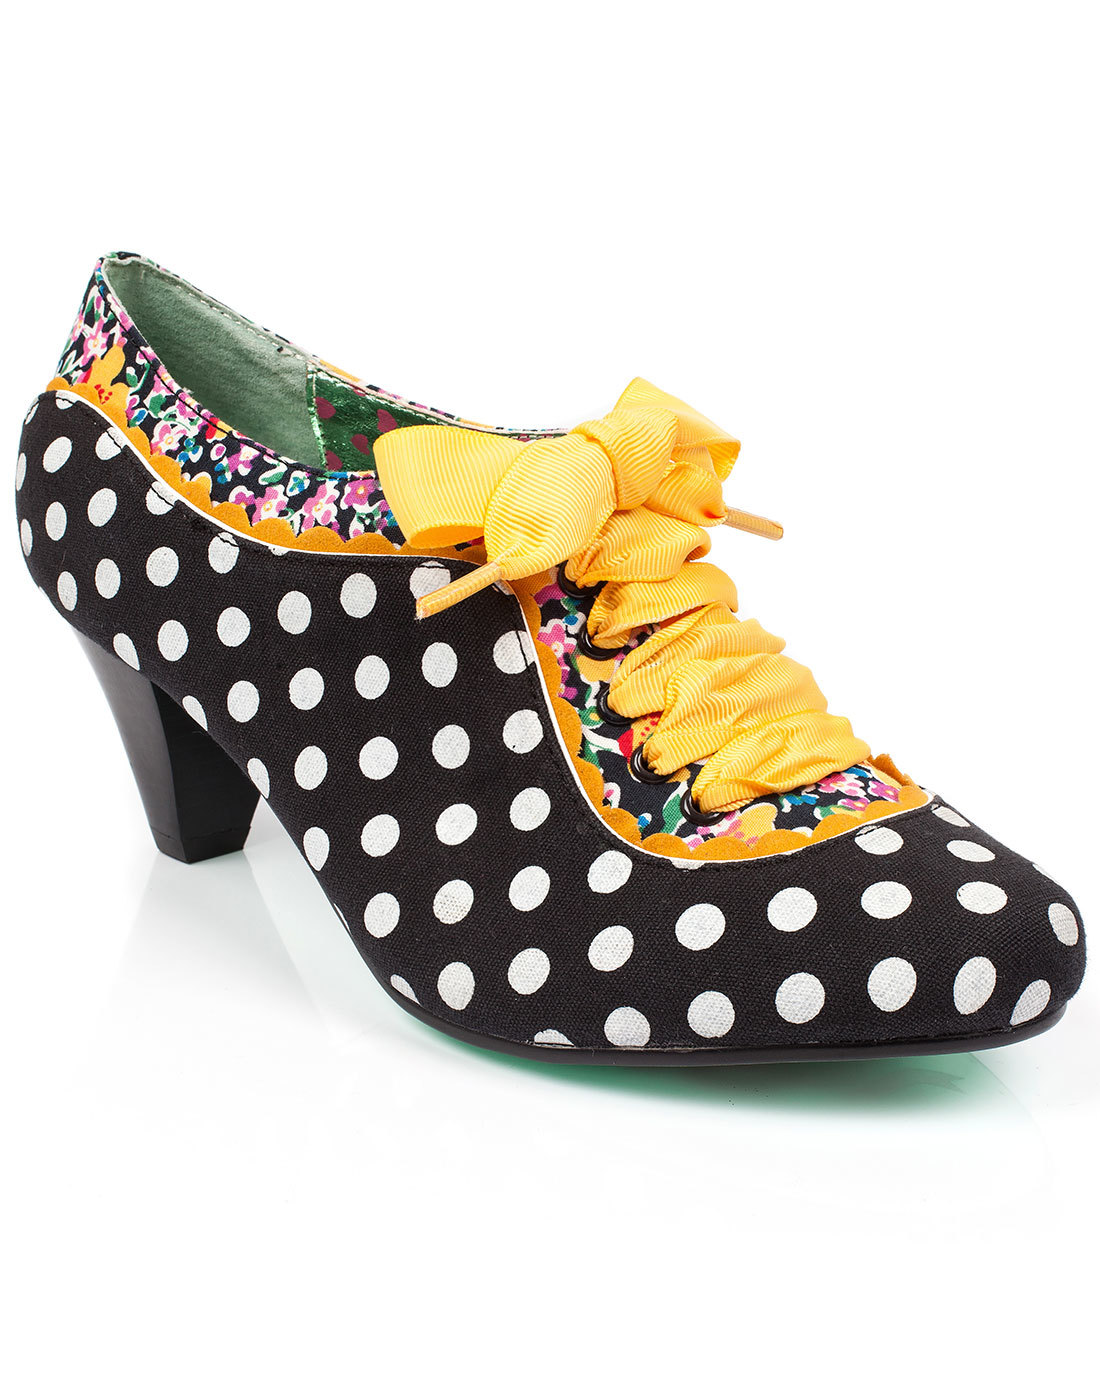 Whiplash POETIC LICENCE 60s Polka Dot Floral Heels